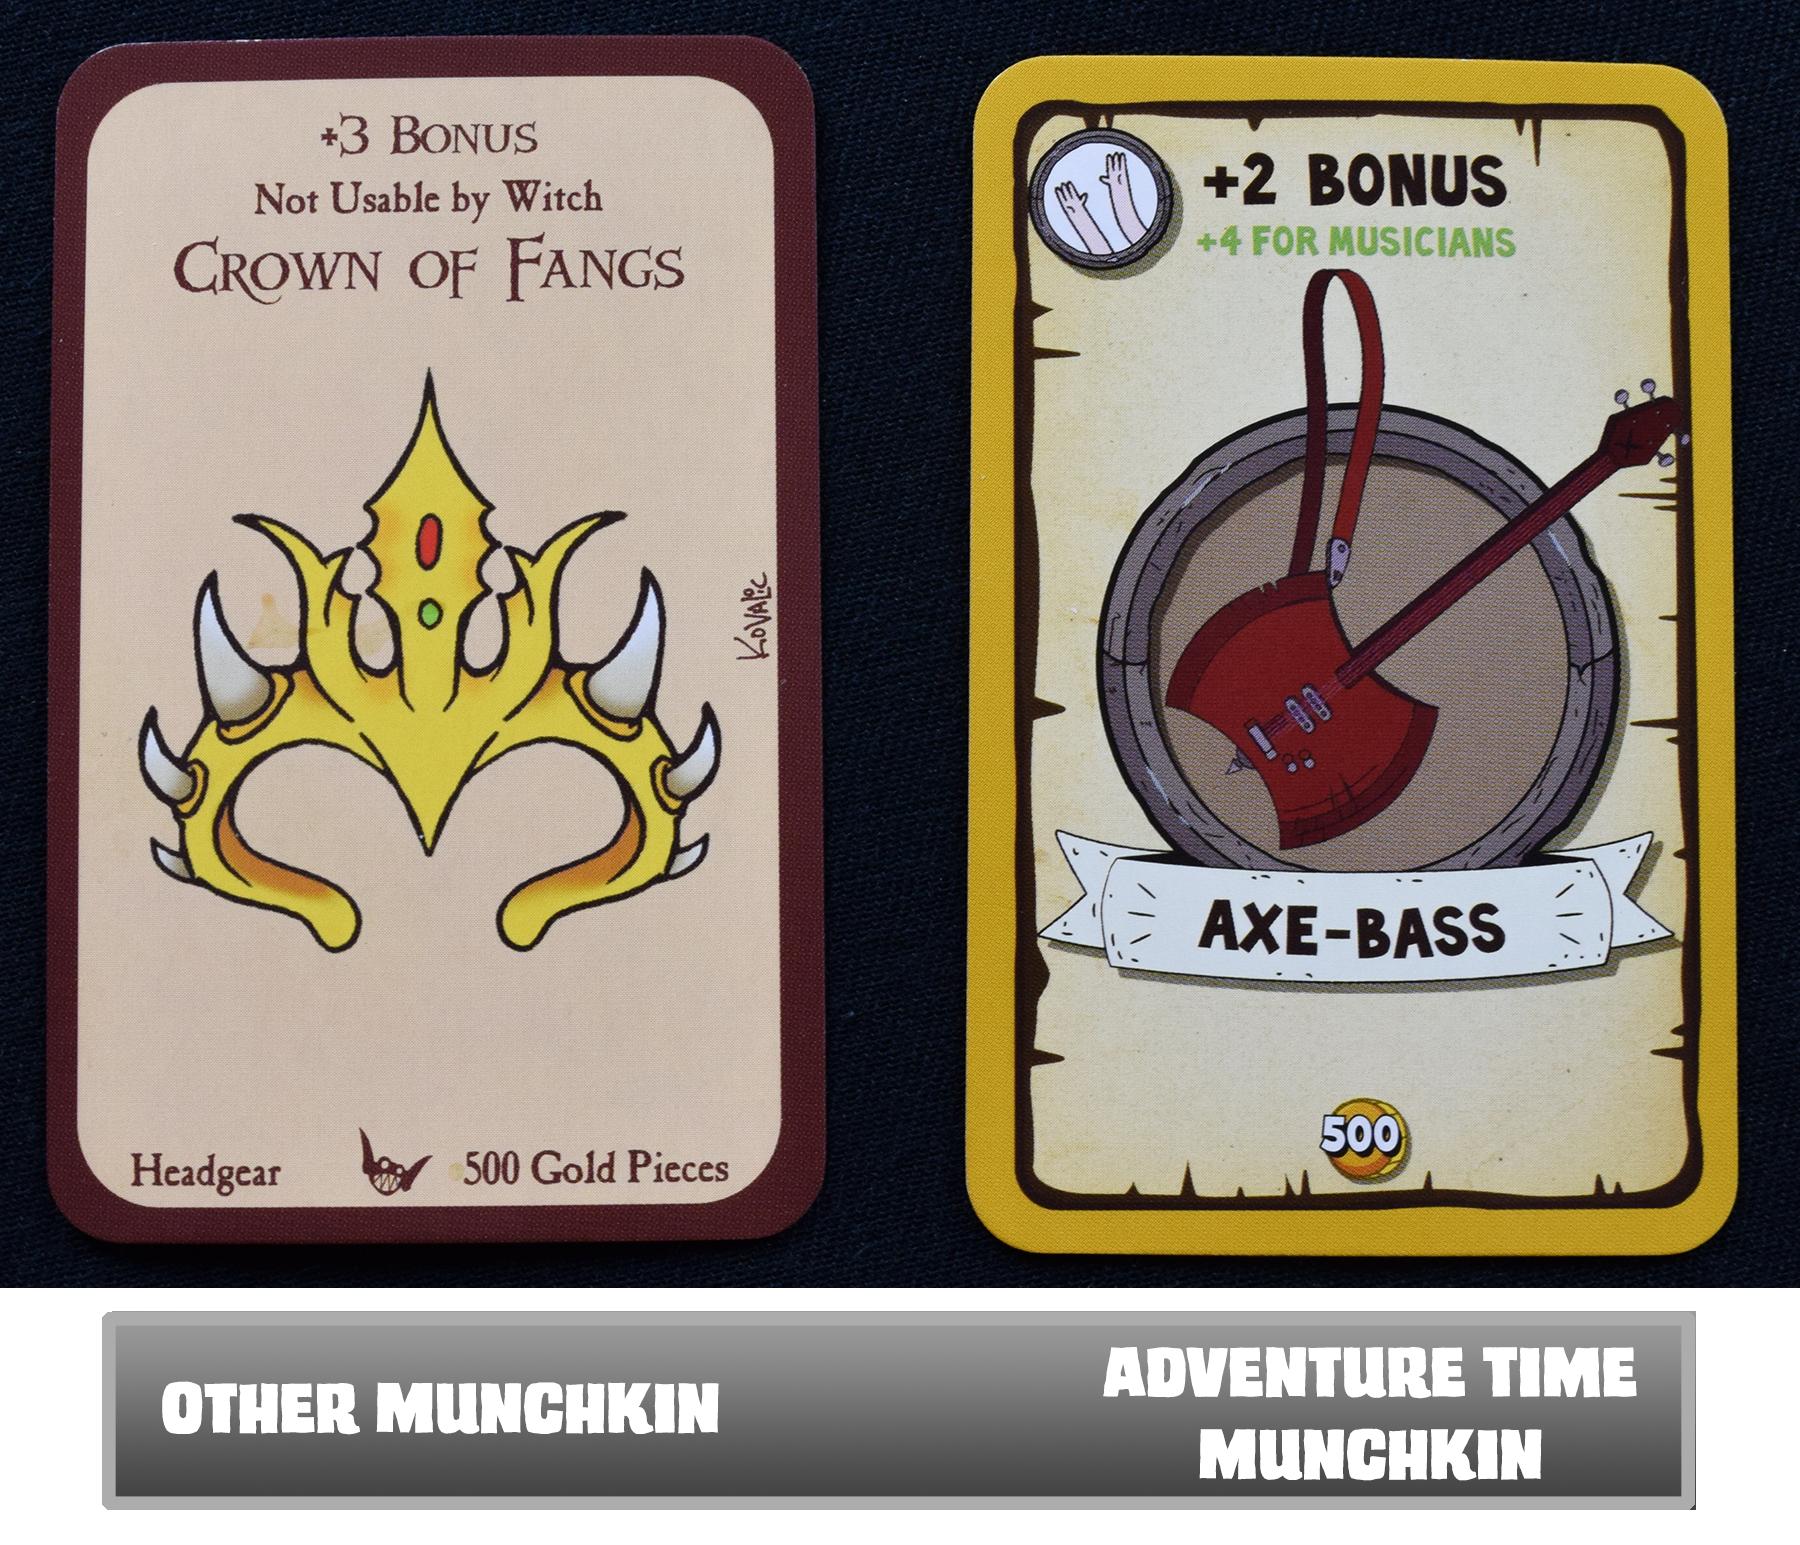 Normal Munchkin cards vs. Adventure Time Munchkin